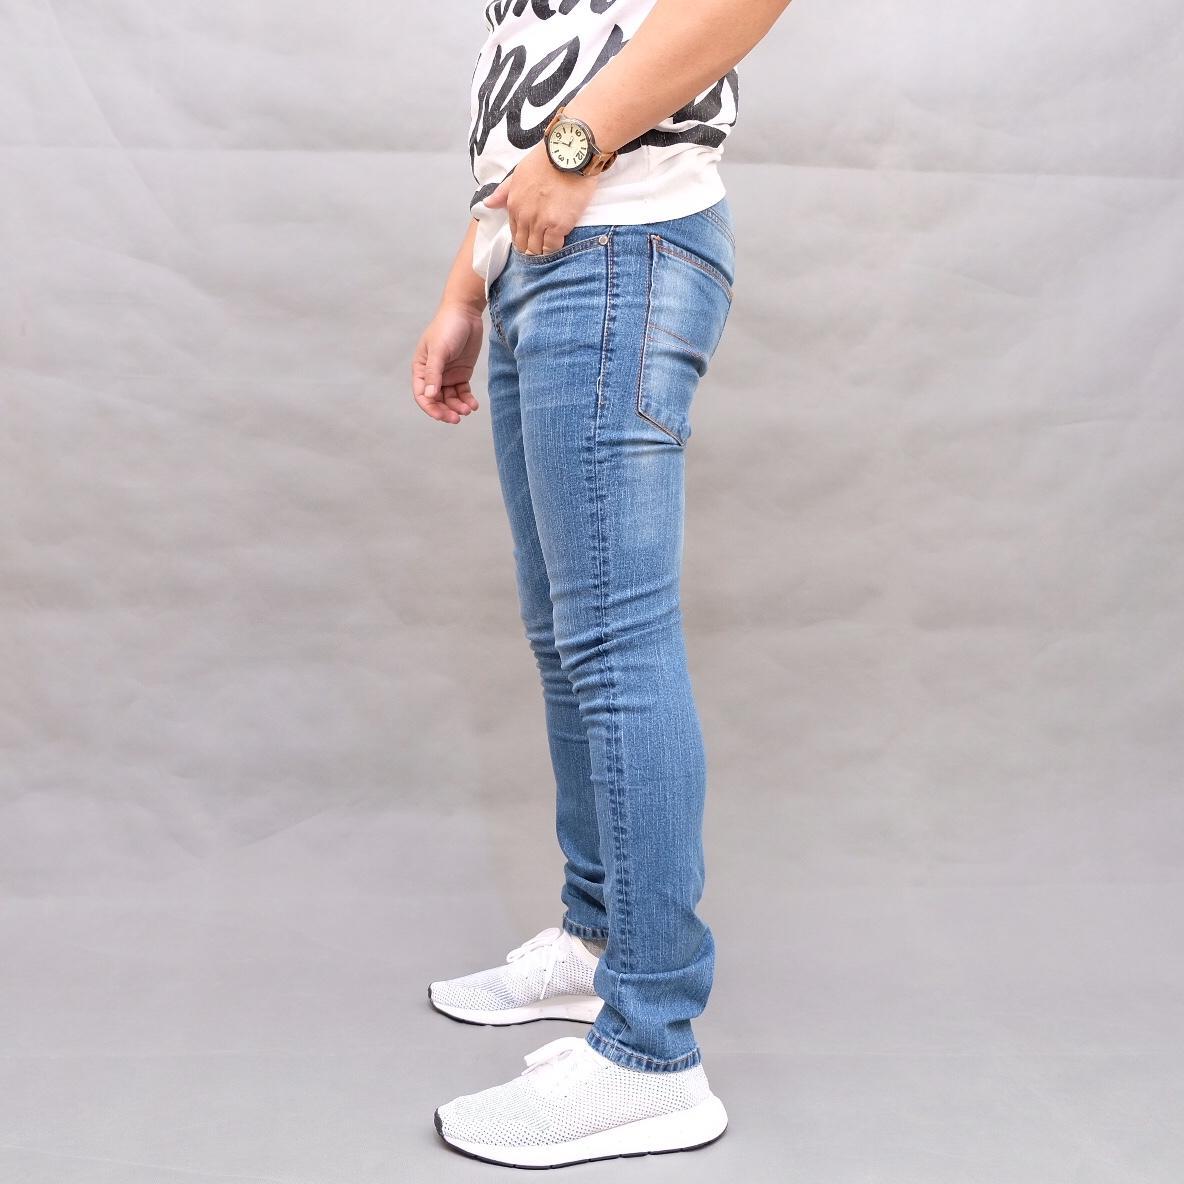 Jual Beli Celana Panjang Kerja Pria Bahan Formal Hr 832 Jeans Fit Skinny Straitch Lentur Melar Sofjeans Straigtch